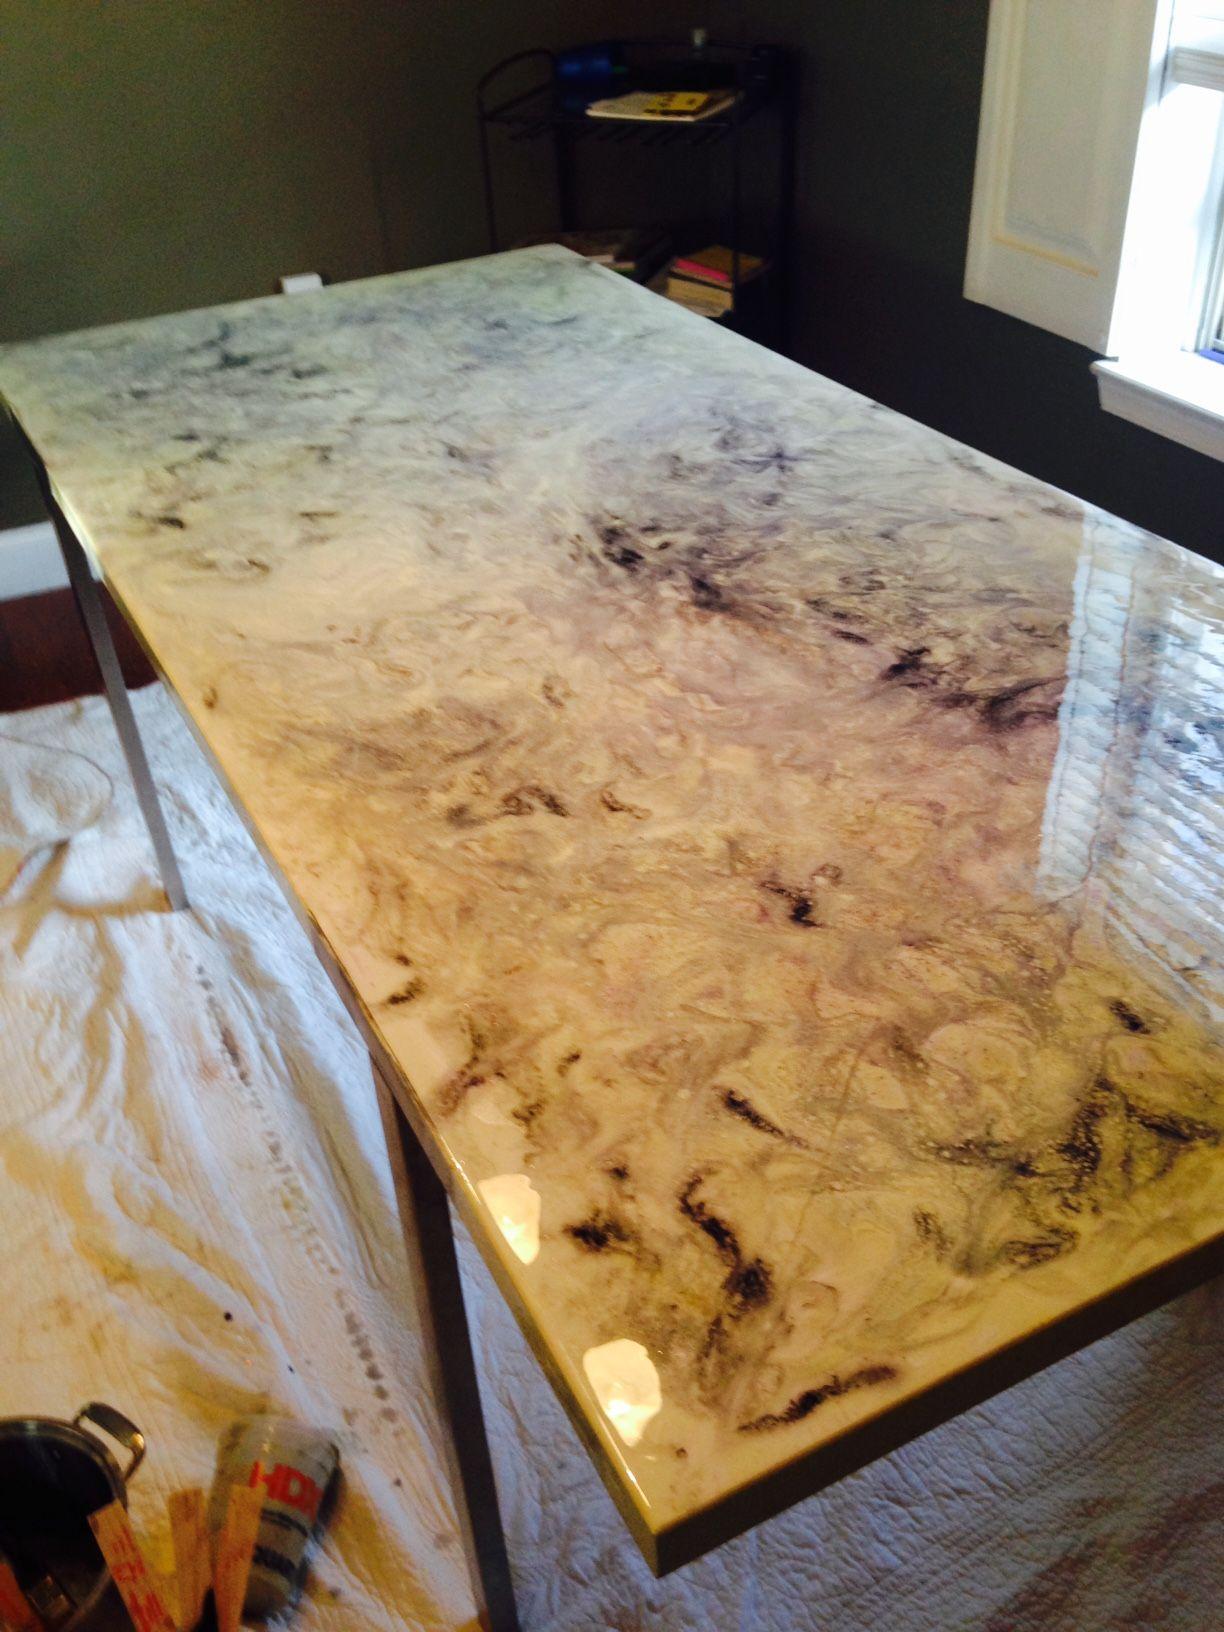 epoxy resin kitchen countertops tuscan design photos white and black countertop table